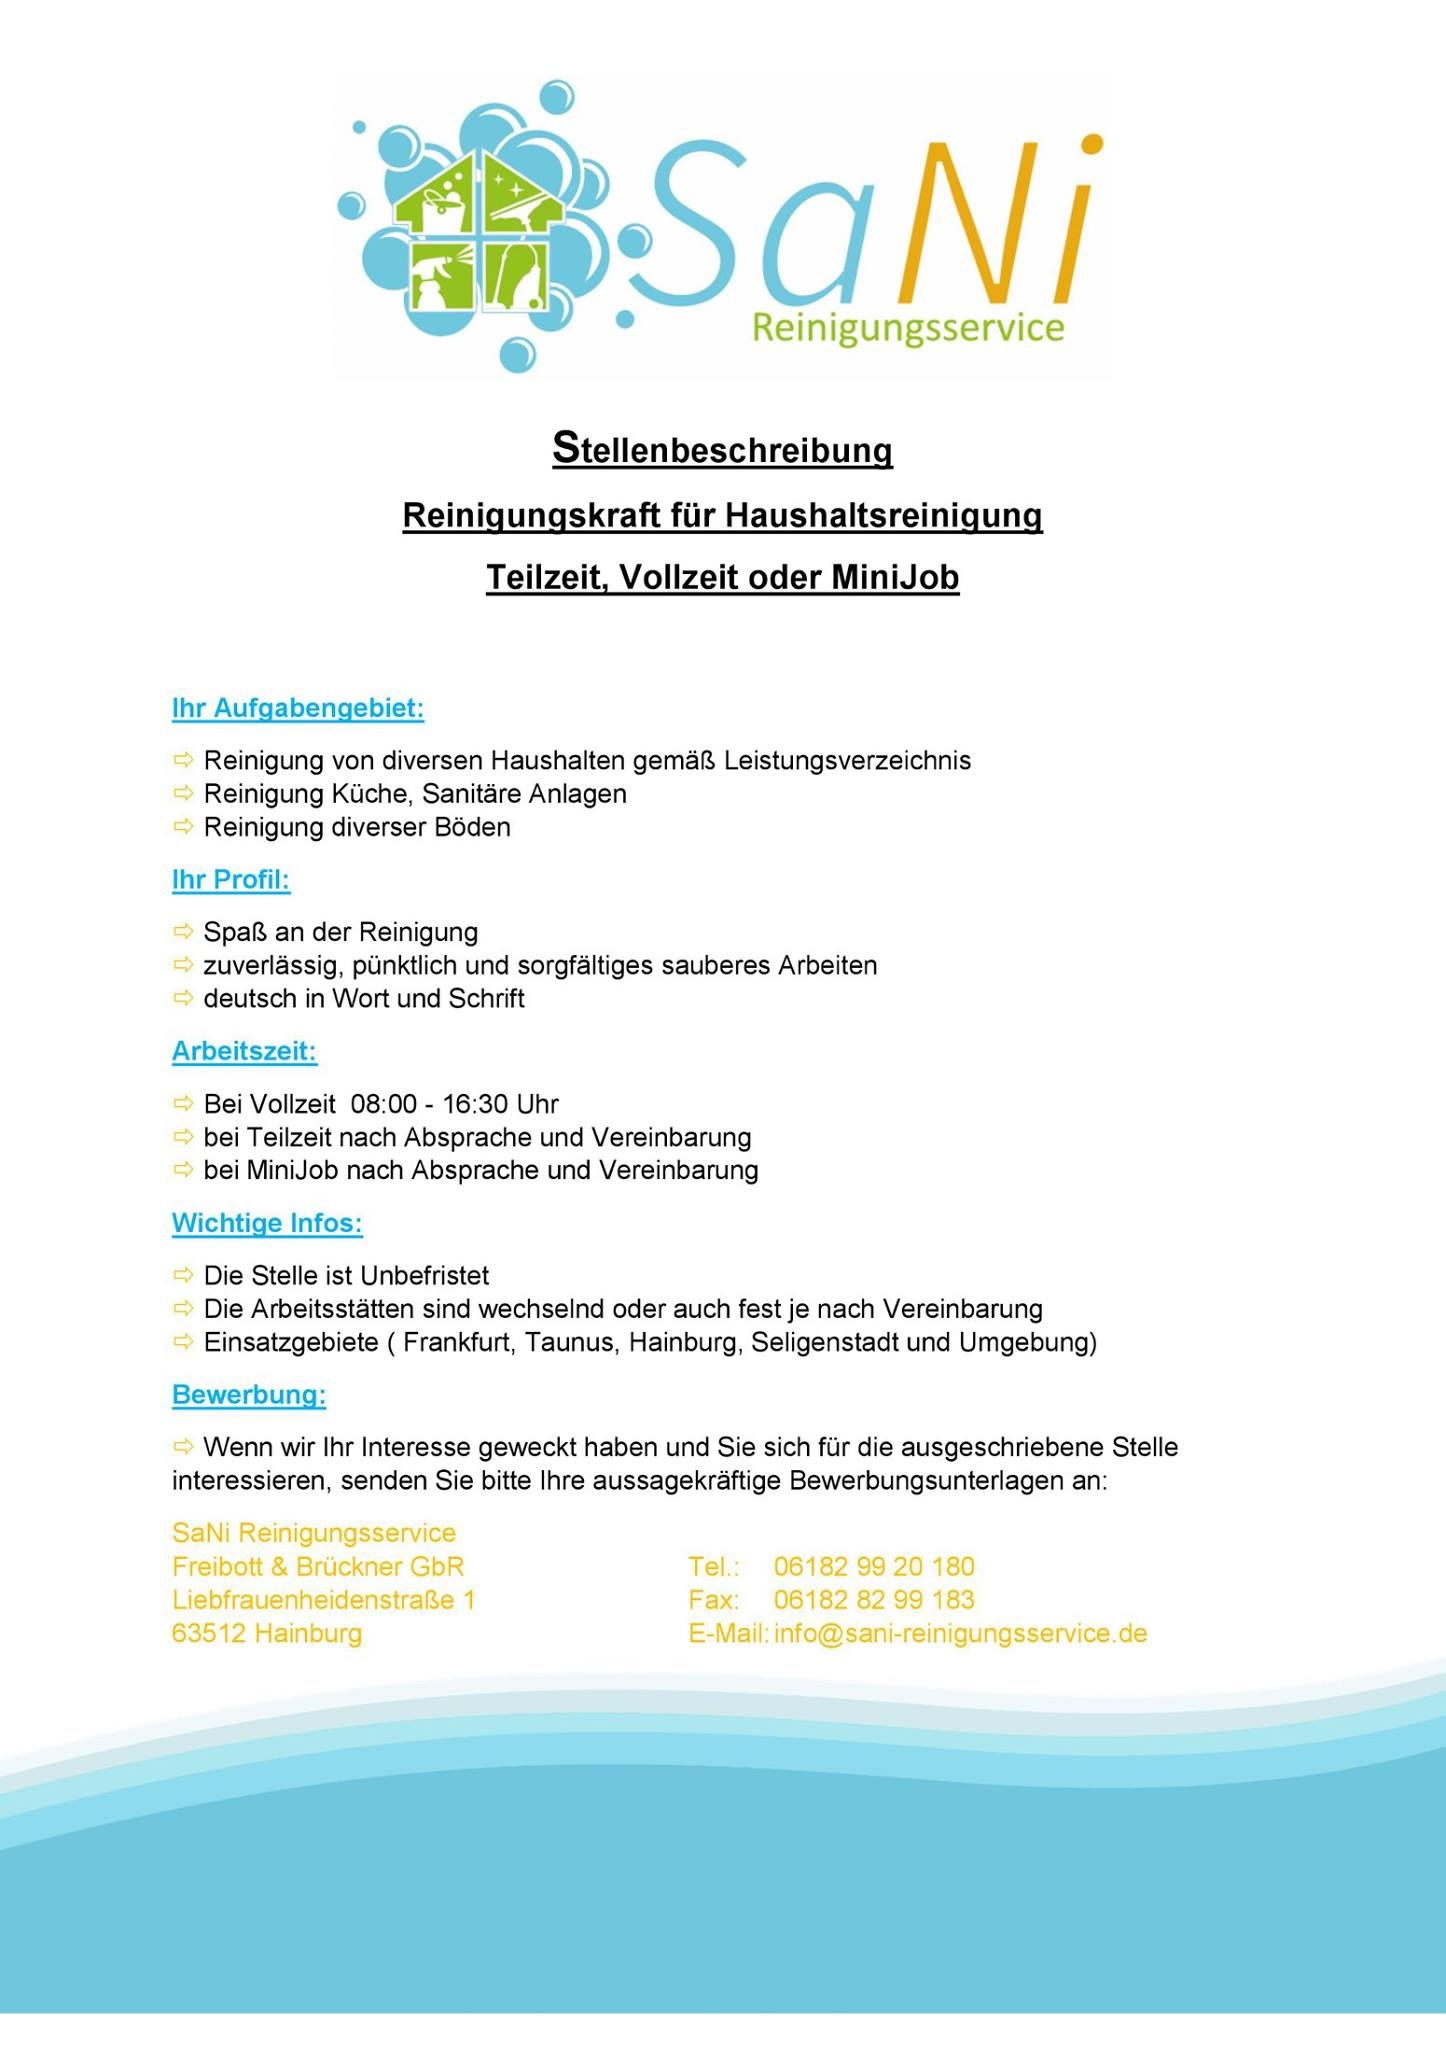 Terrific Möbelhäuser Frankfurt Am Main Und Umgebung Ideas Of Sani. >>